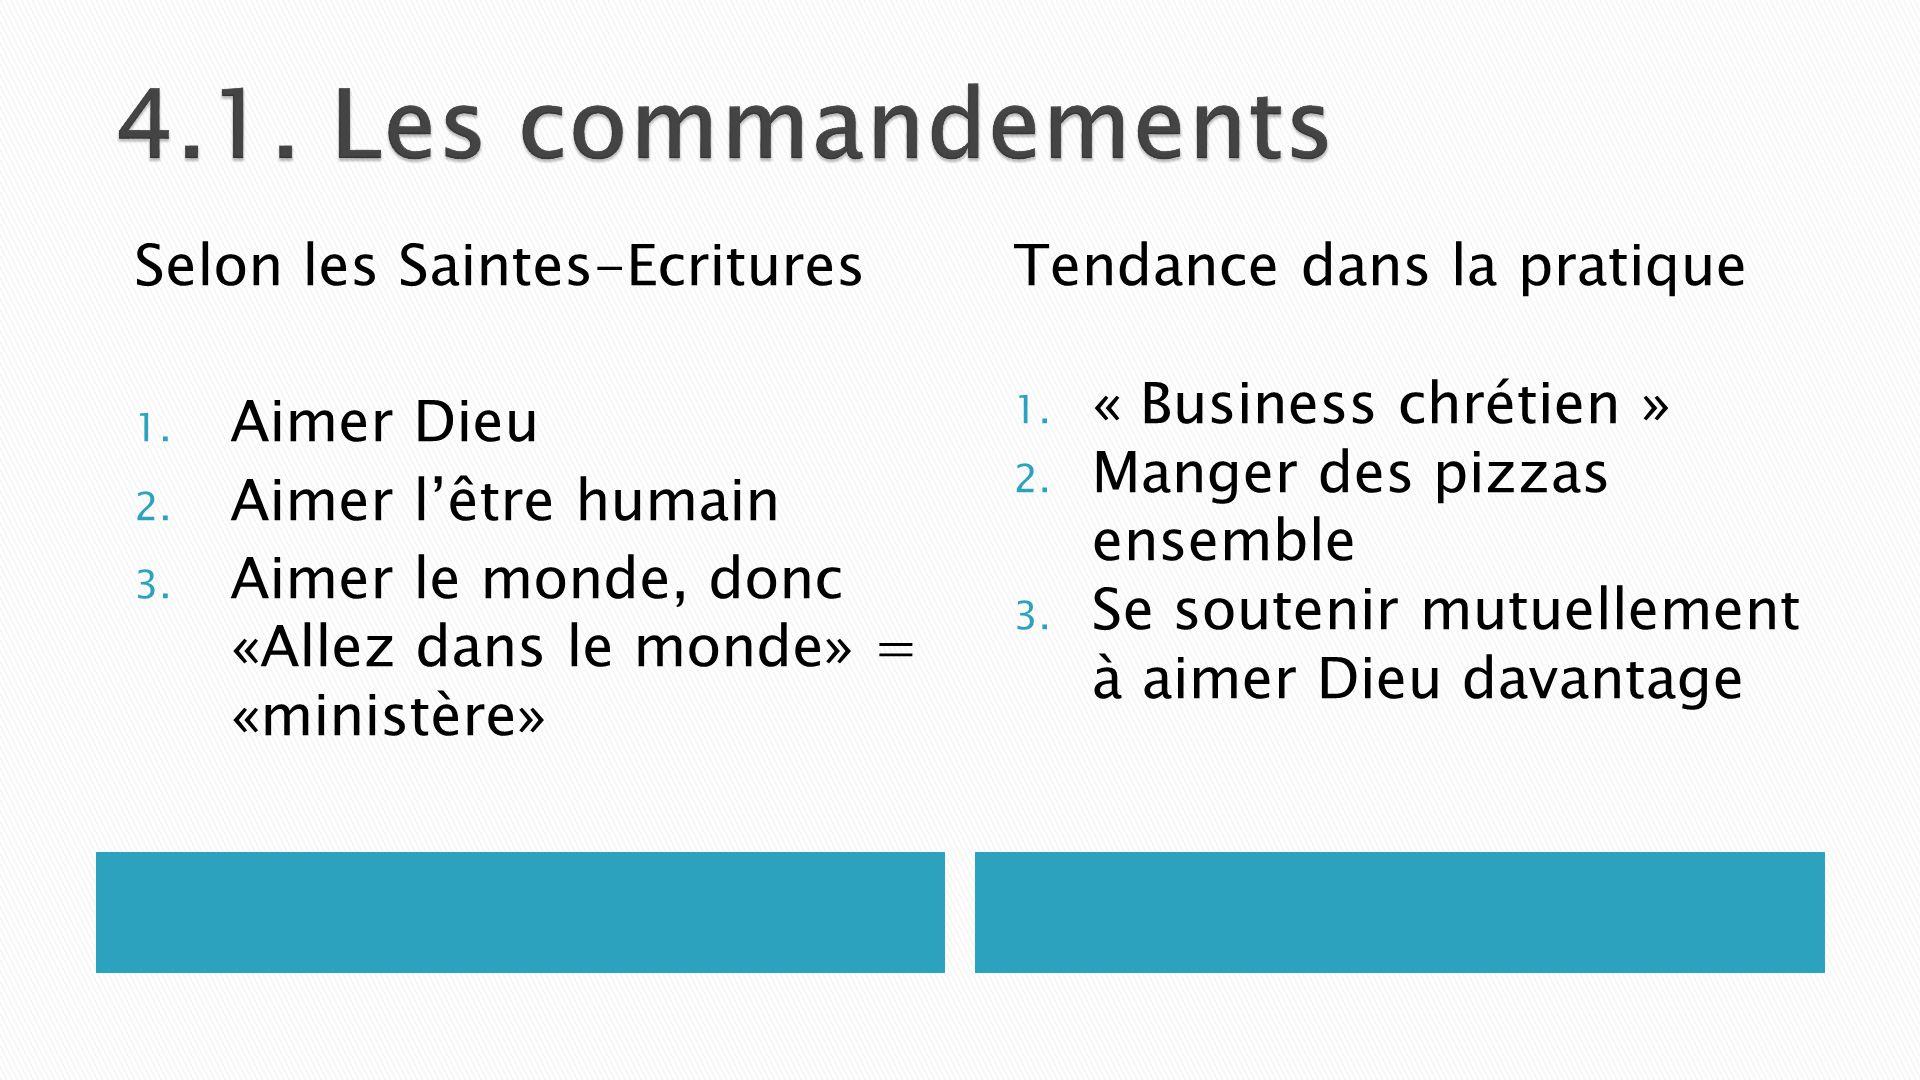 4.1. Les commandements Selon les Saintes-Ecritures Aimer Dieu